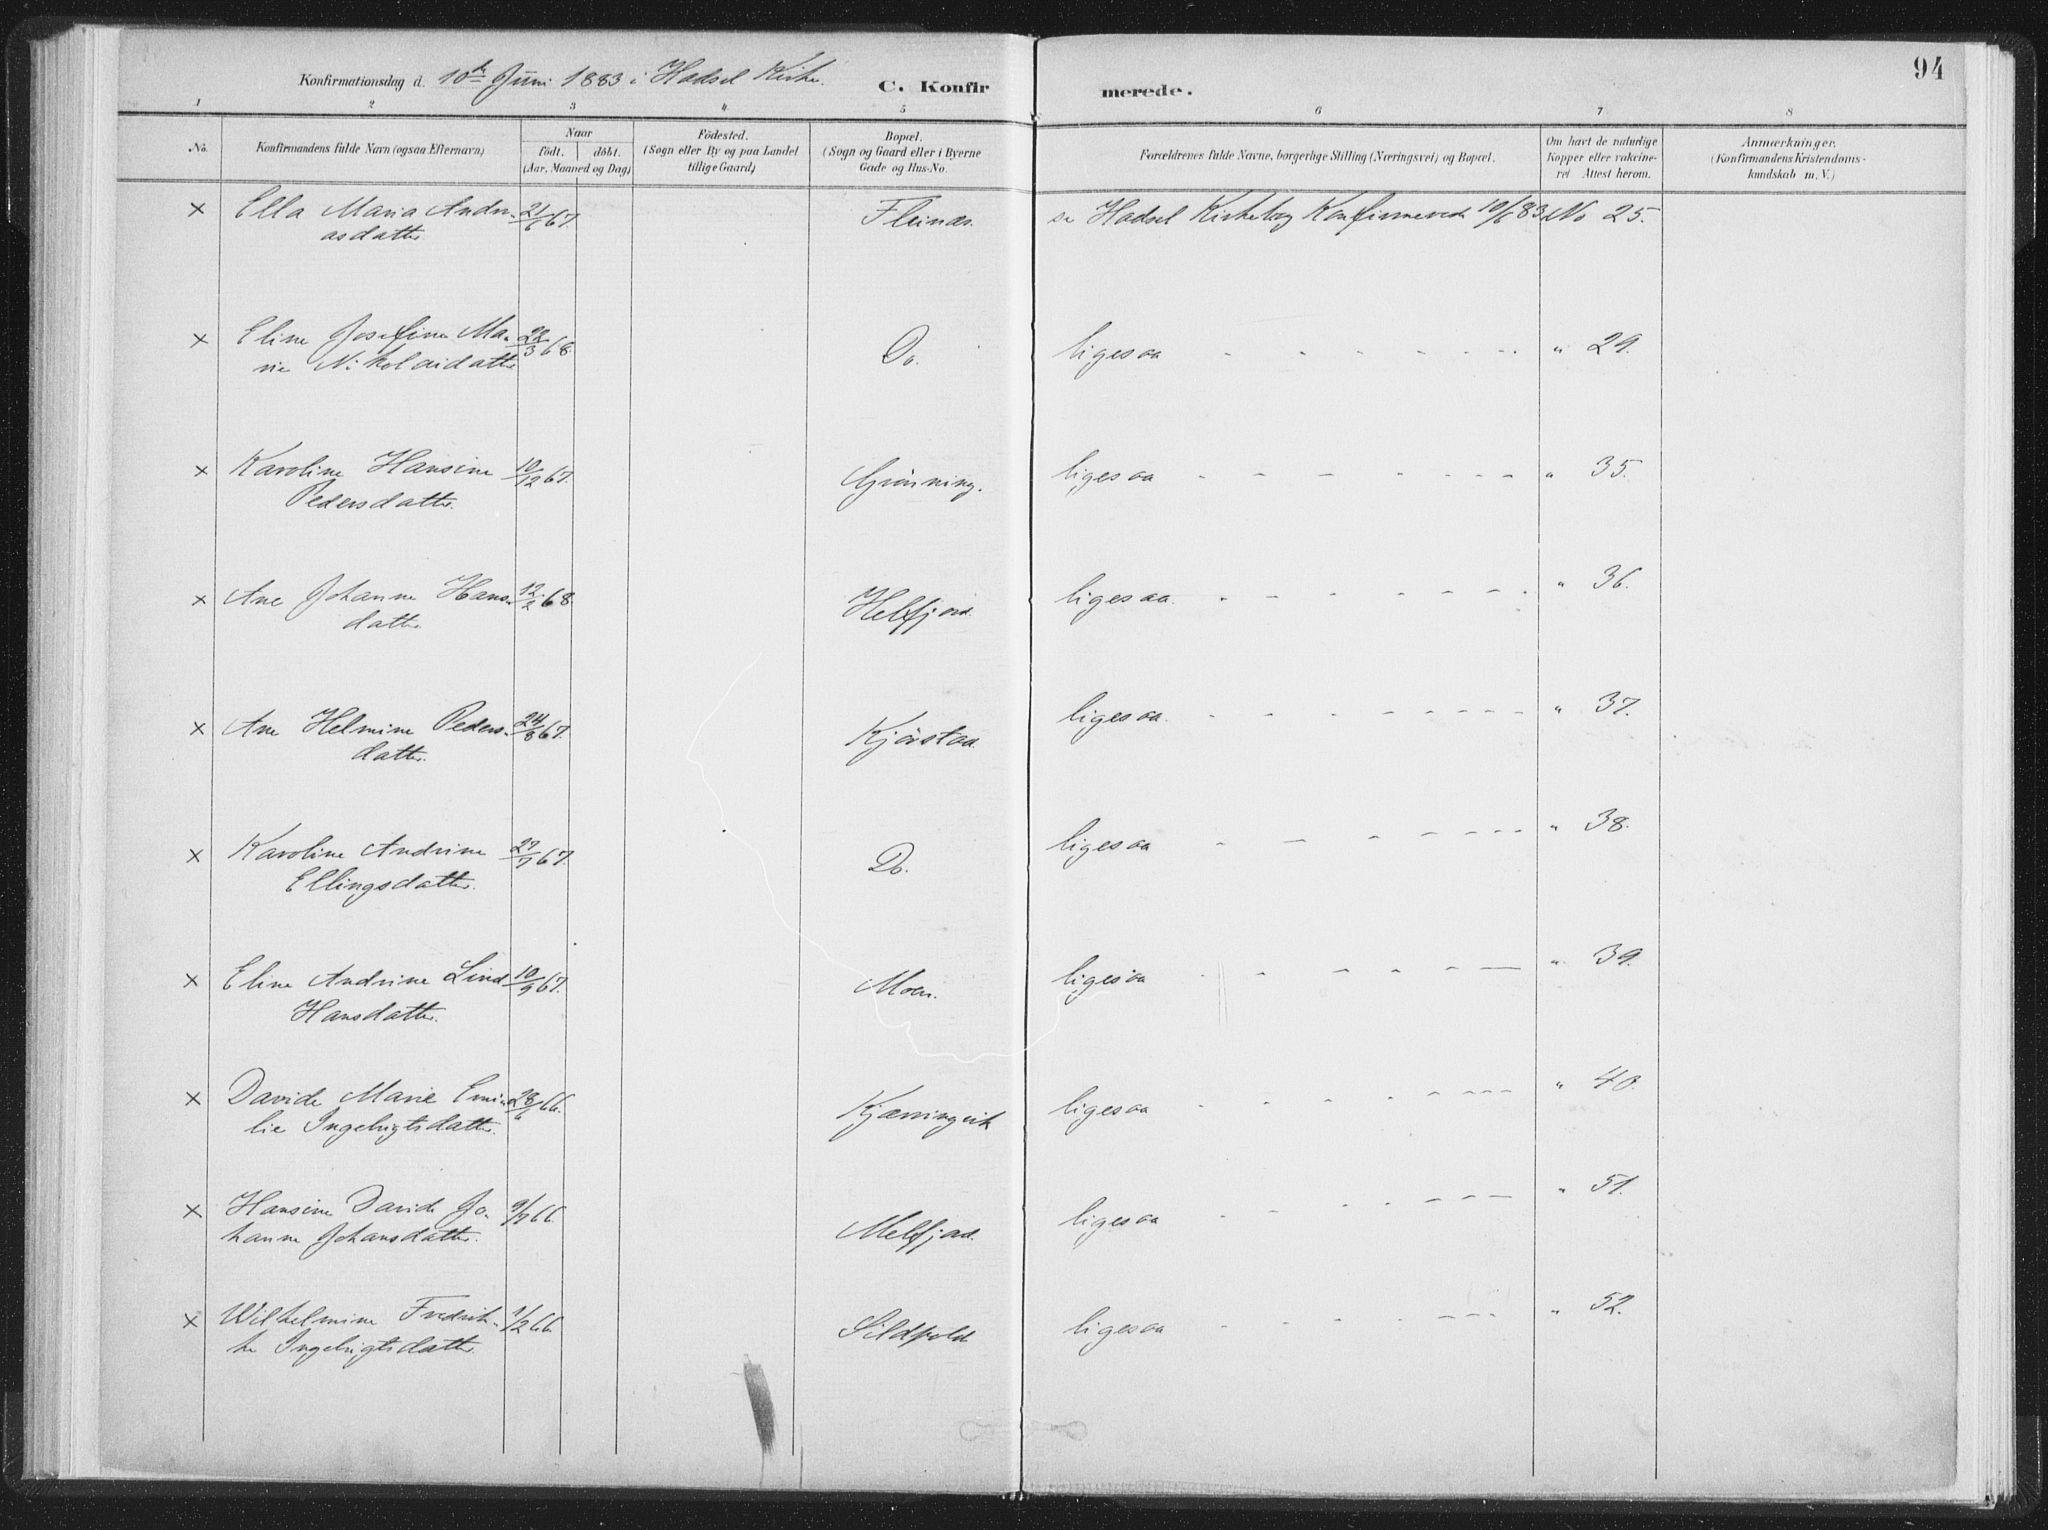 SAT, Ministerialprotokoller, klokkerbøker og fødselsregistre - Nordland, 890/L1286: Ministerialbok nr. 890A01, 1882-1902, s. 94